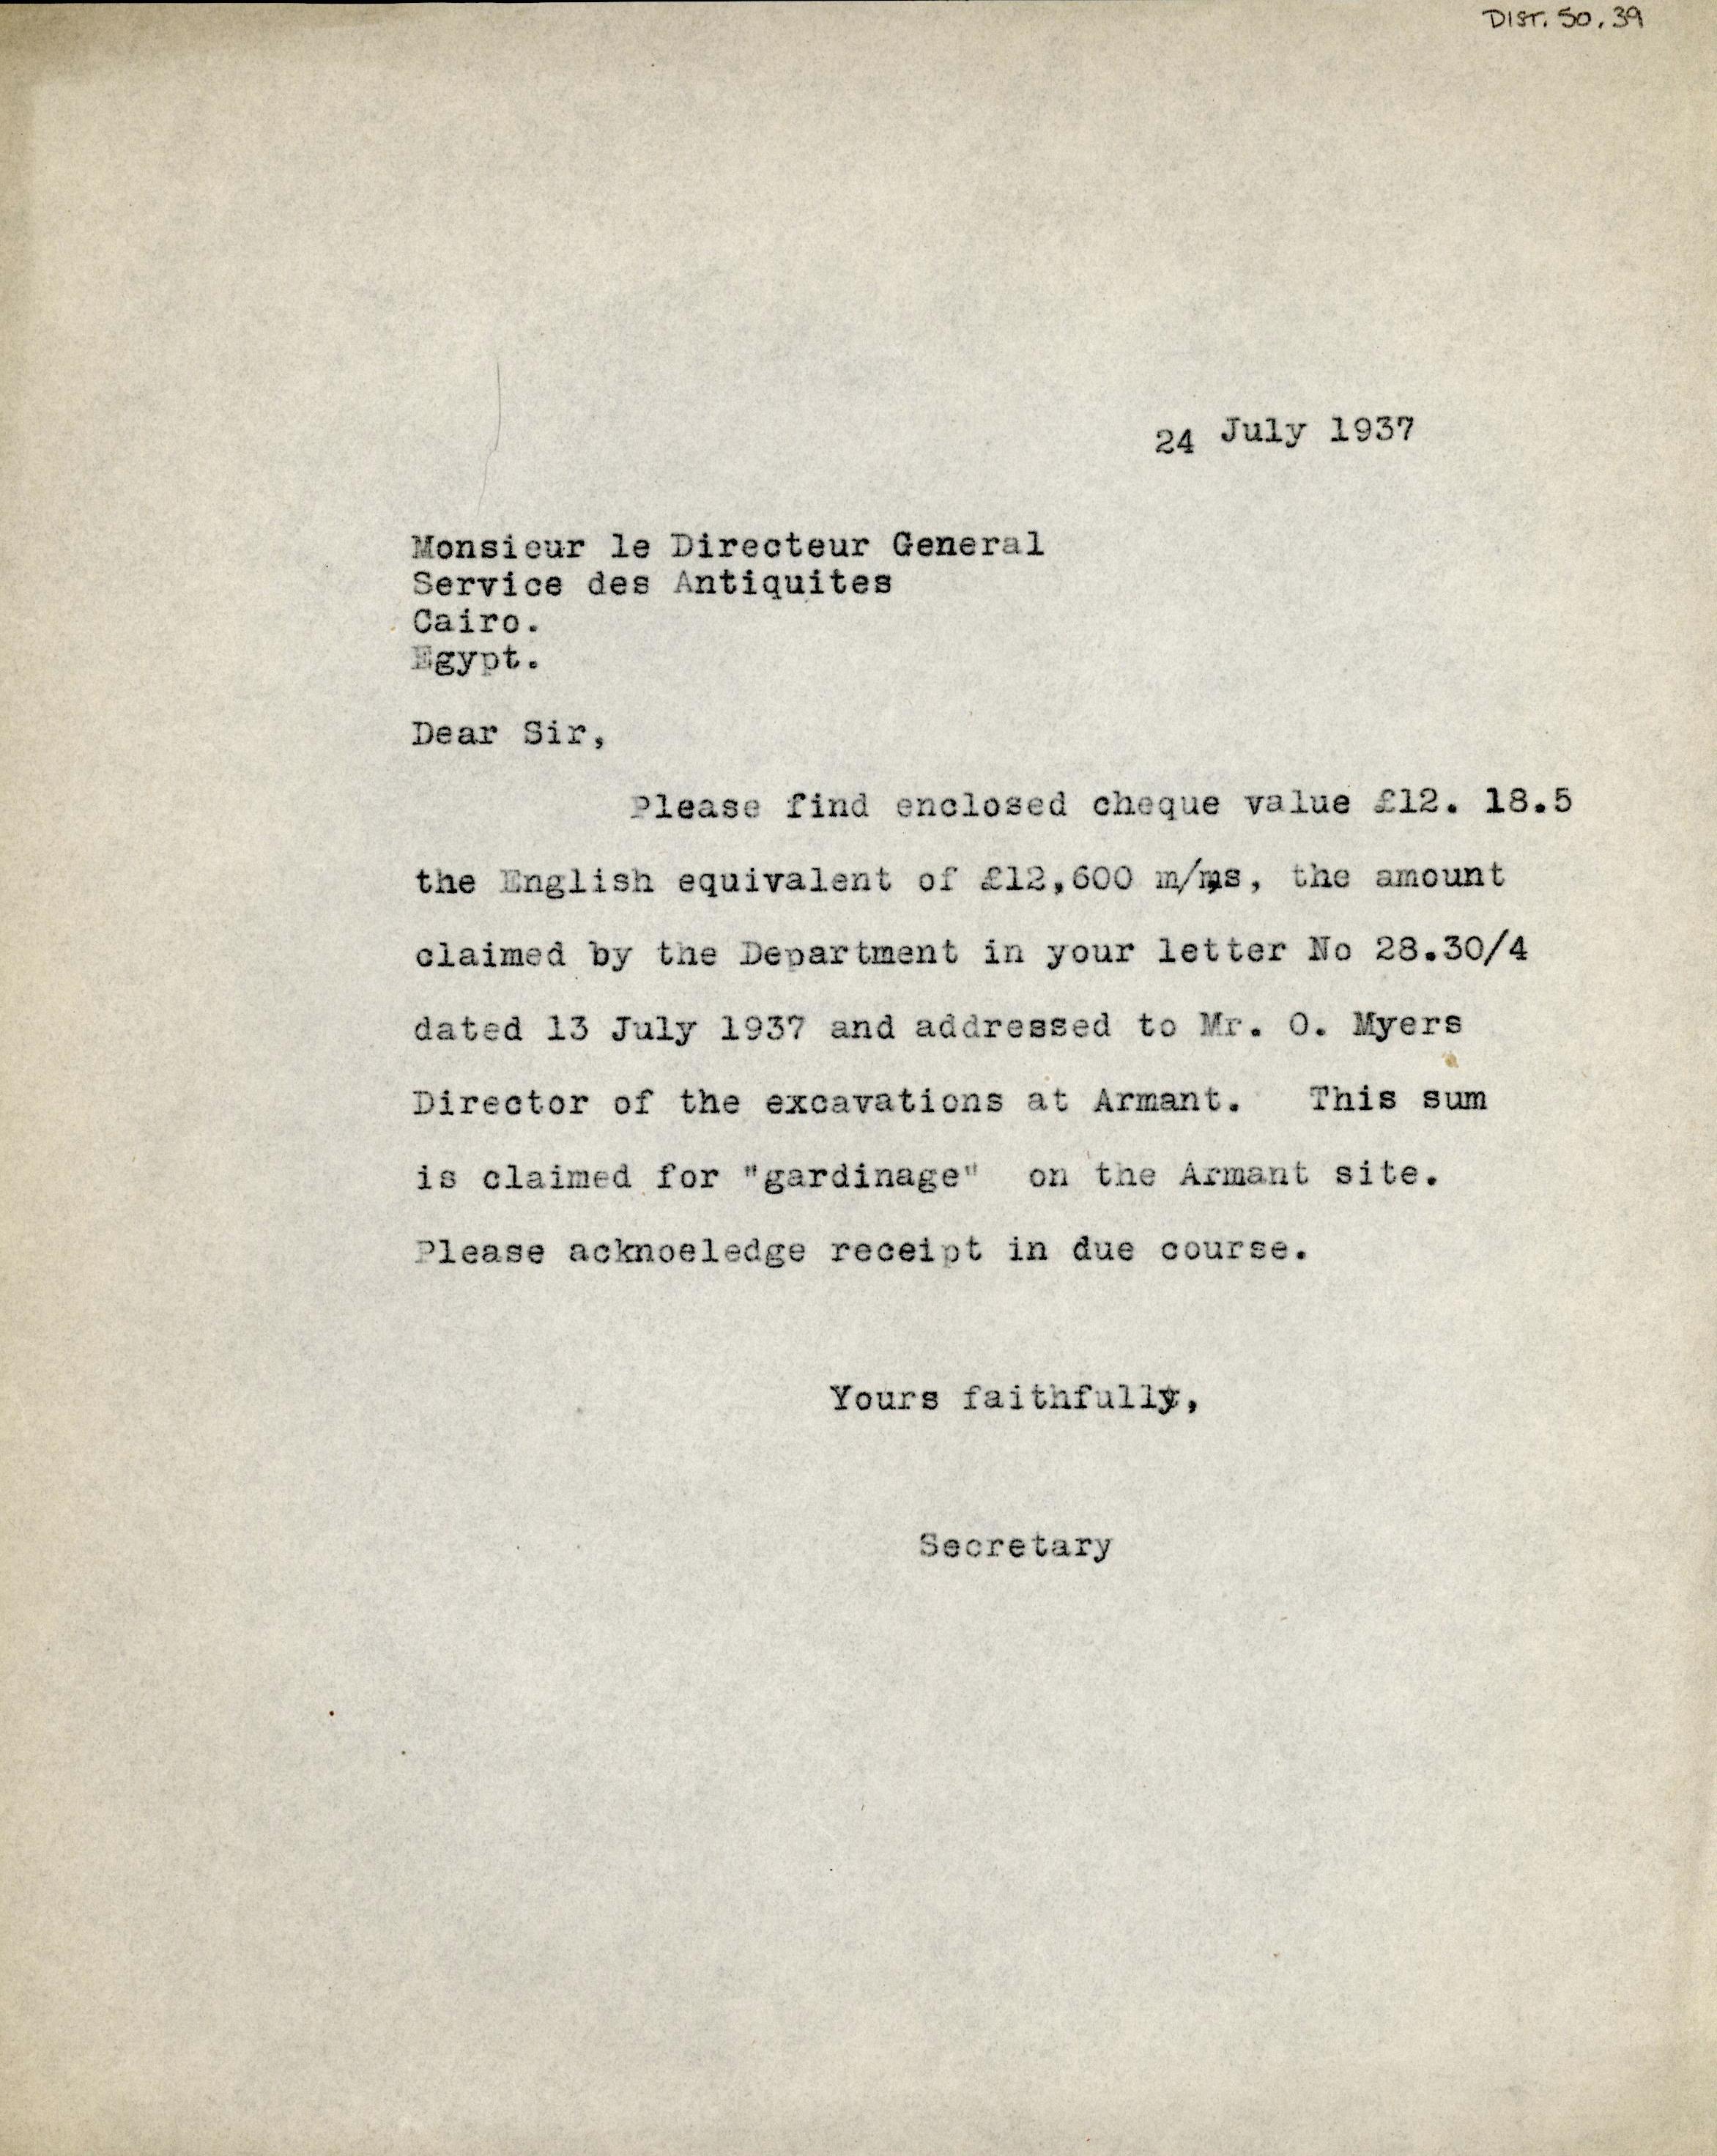 1926-39 correspondence with Antiquities Service DIST.50.39